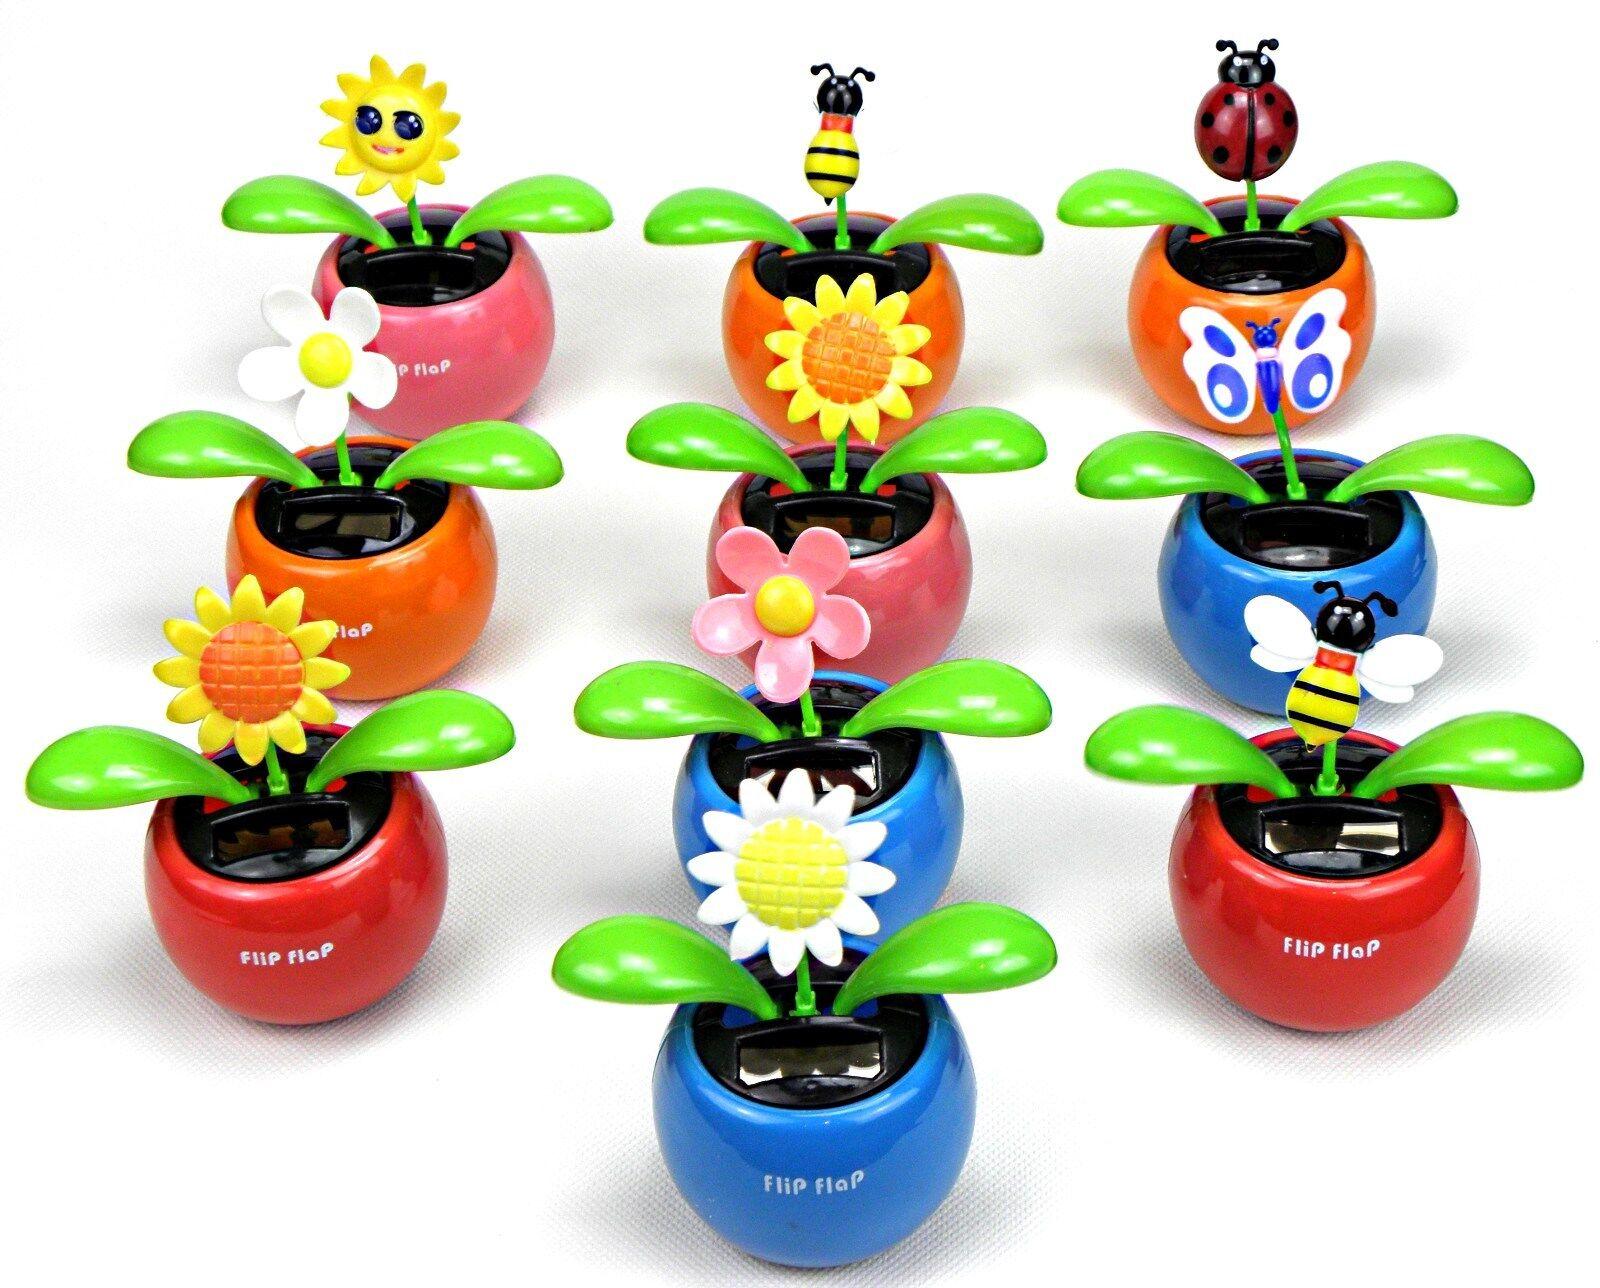 20 Stück WackelBlume Solarblume Flip Flap Solar Flower Blume MEGAPREIS NEUWARE